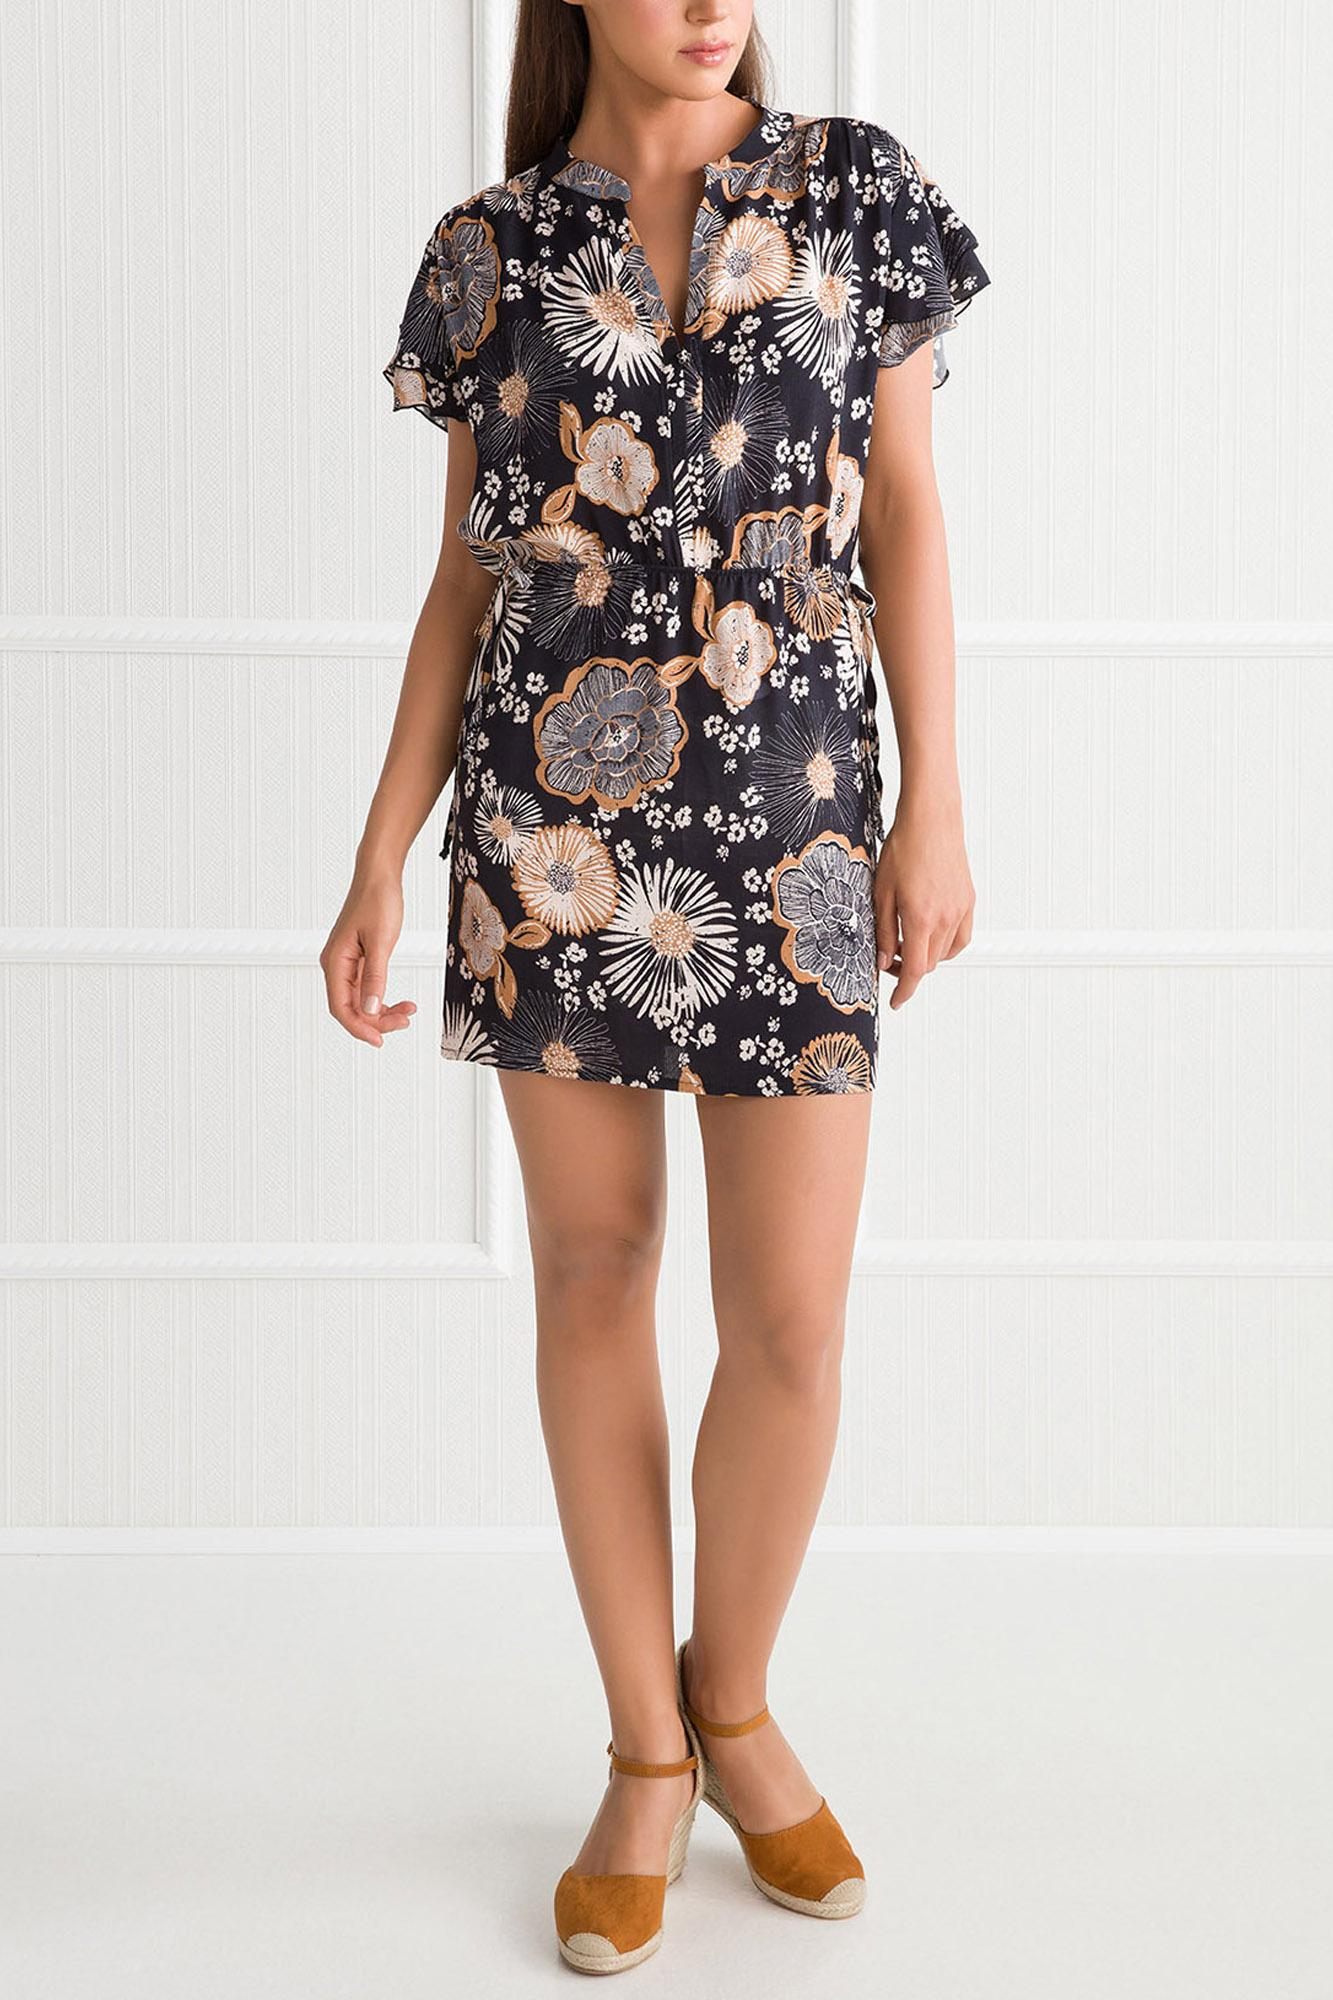 Dark Printed Dress